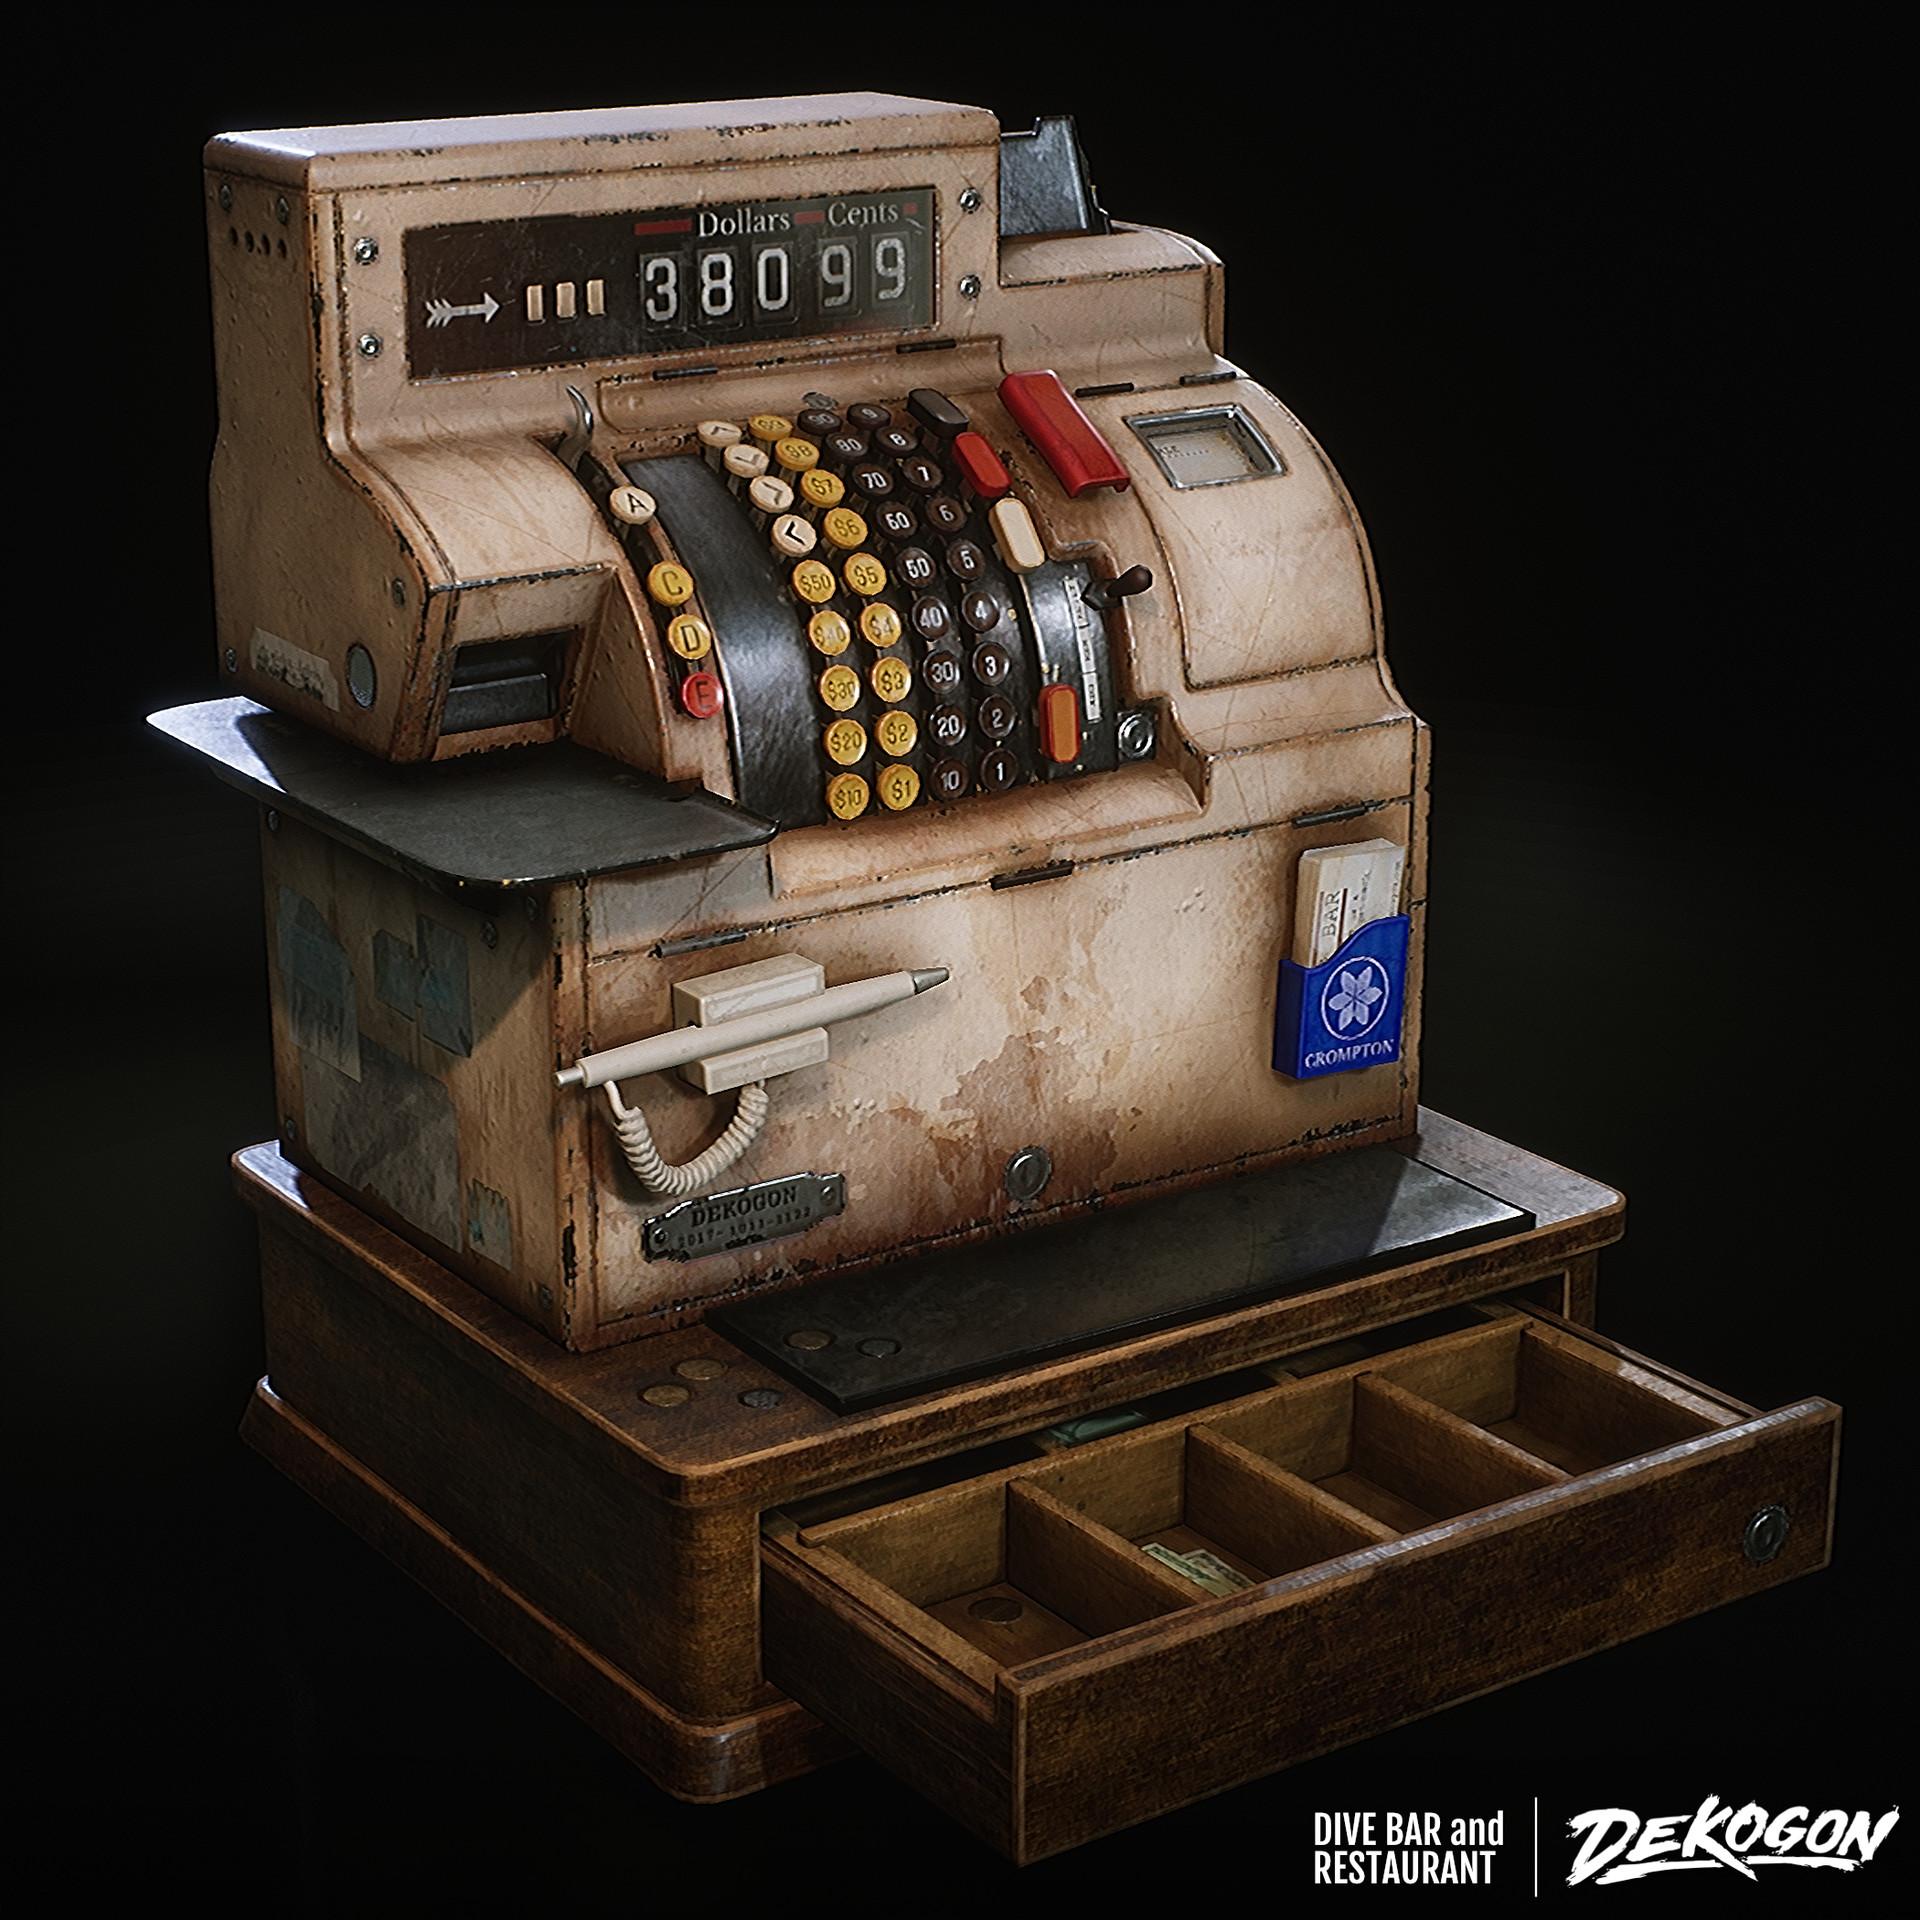 Wahyu nugraha cashregister 01 02